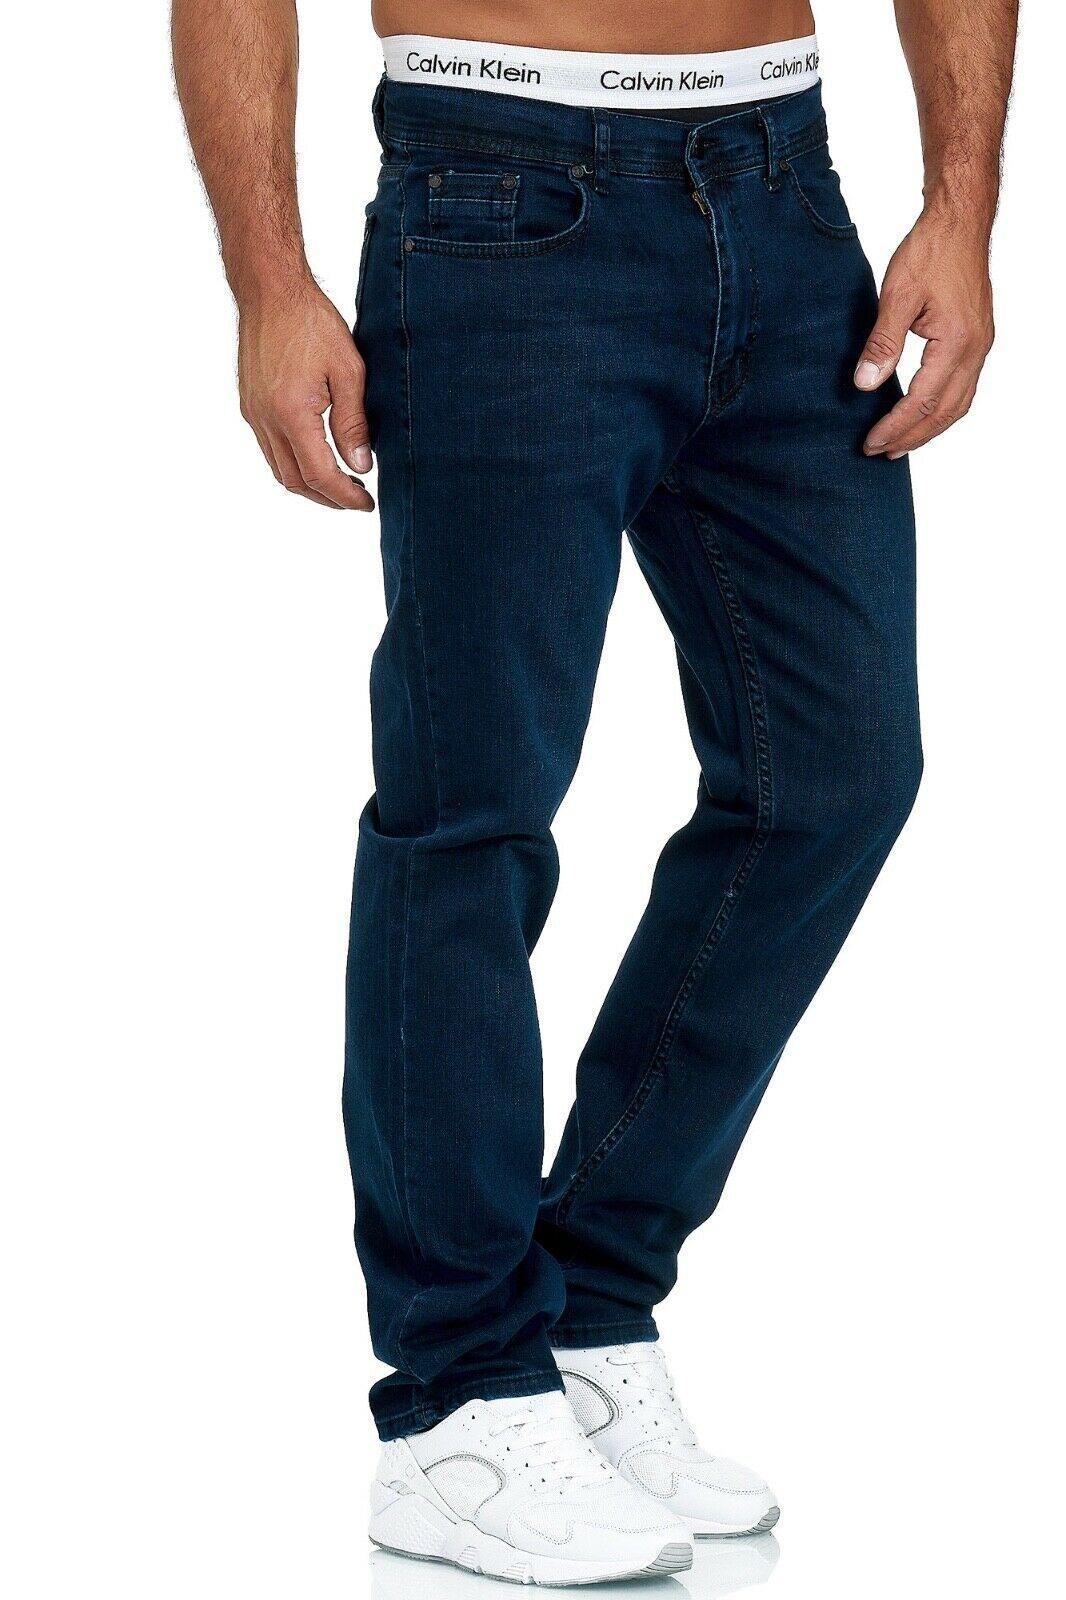 Herren-Jeans-Hose-Denim-KC-Black-Washed-Straight-Cut-Regular-Dicke-Naht-naehte Indexbild 43